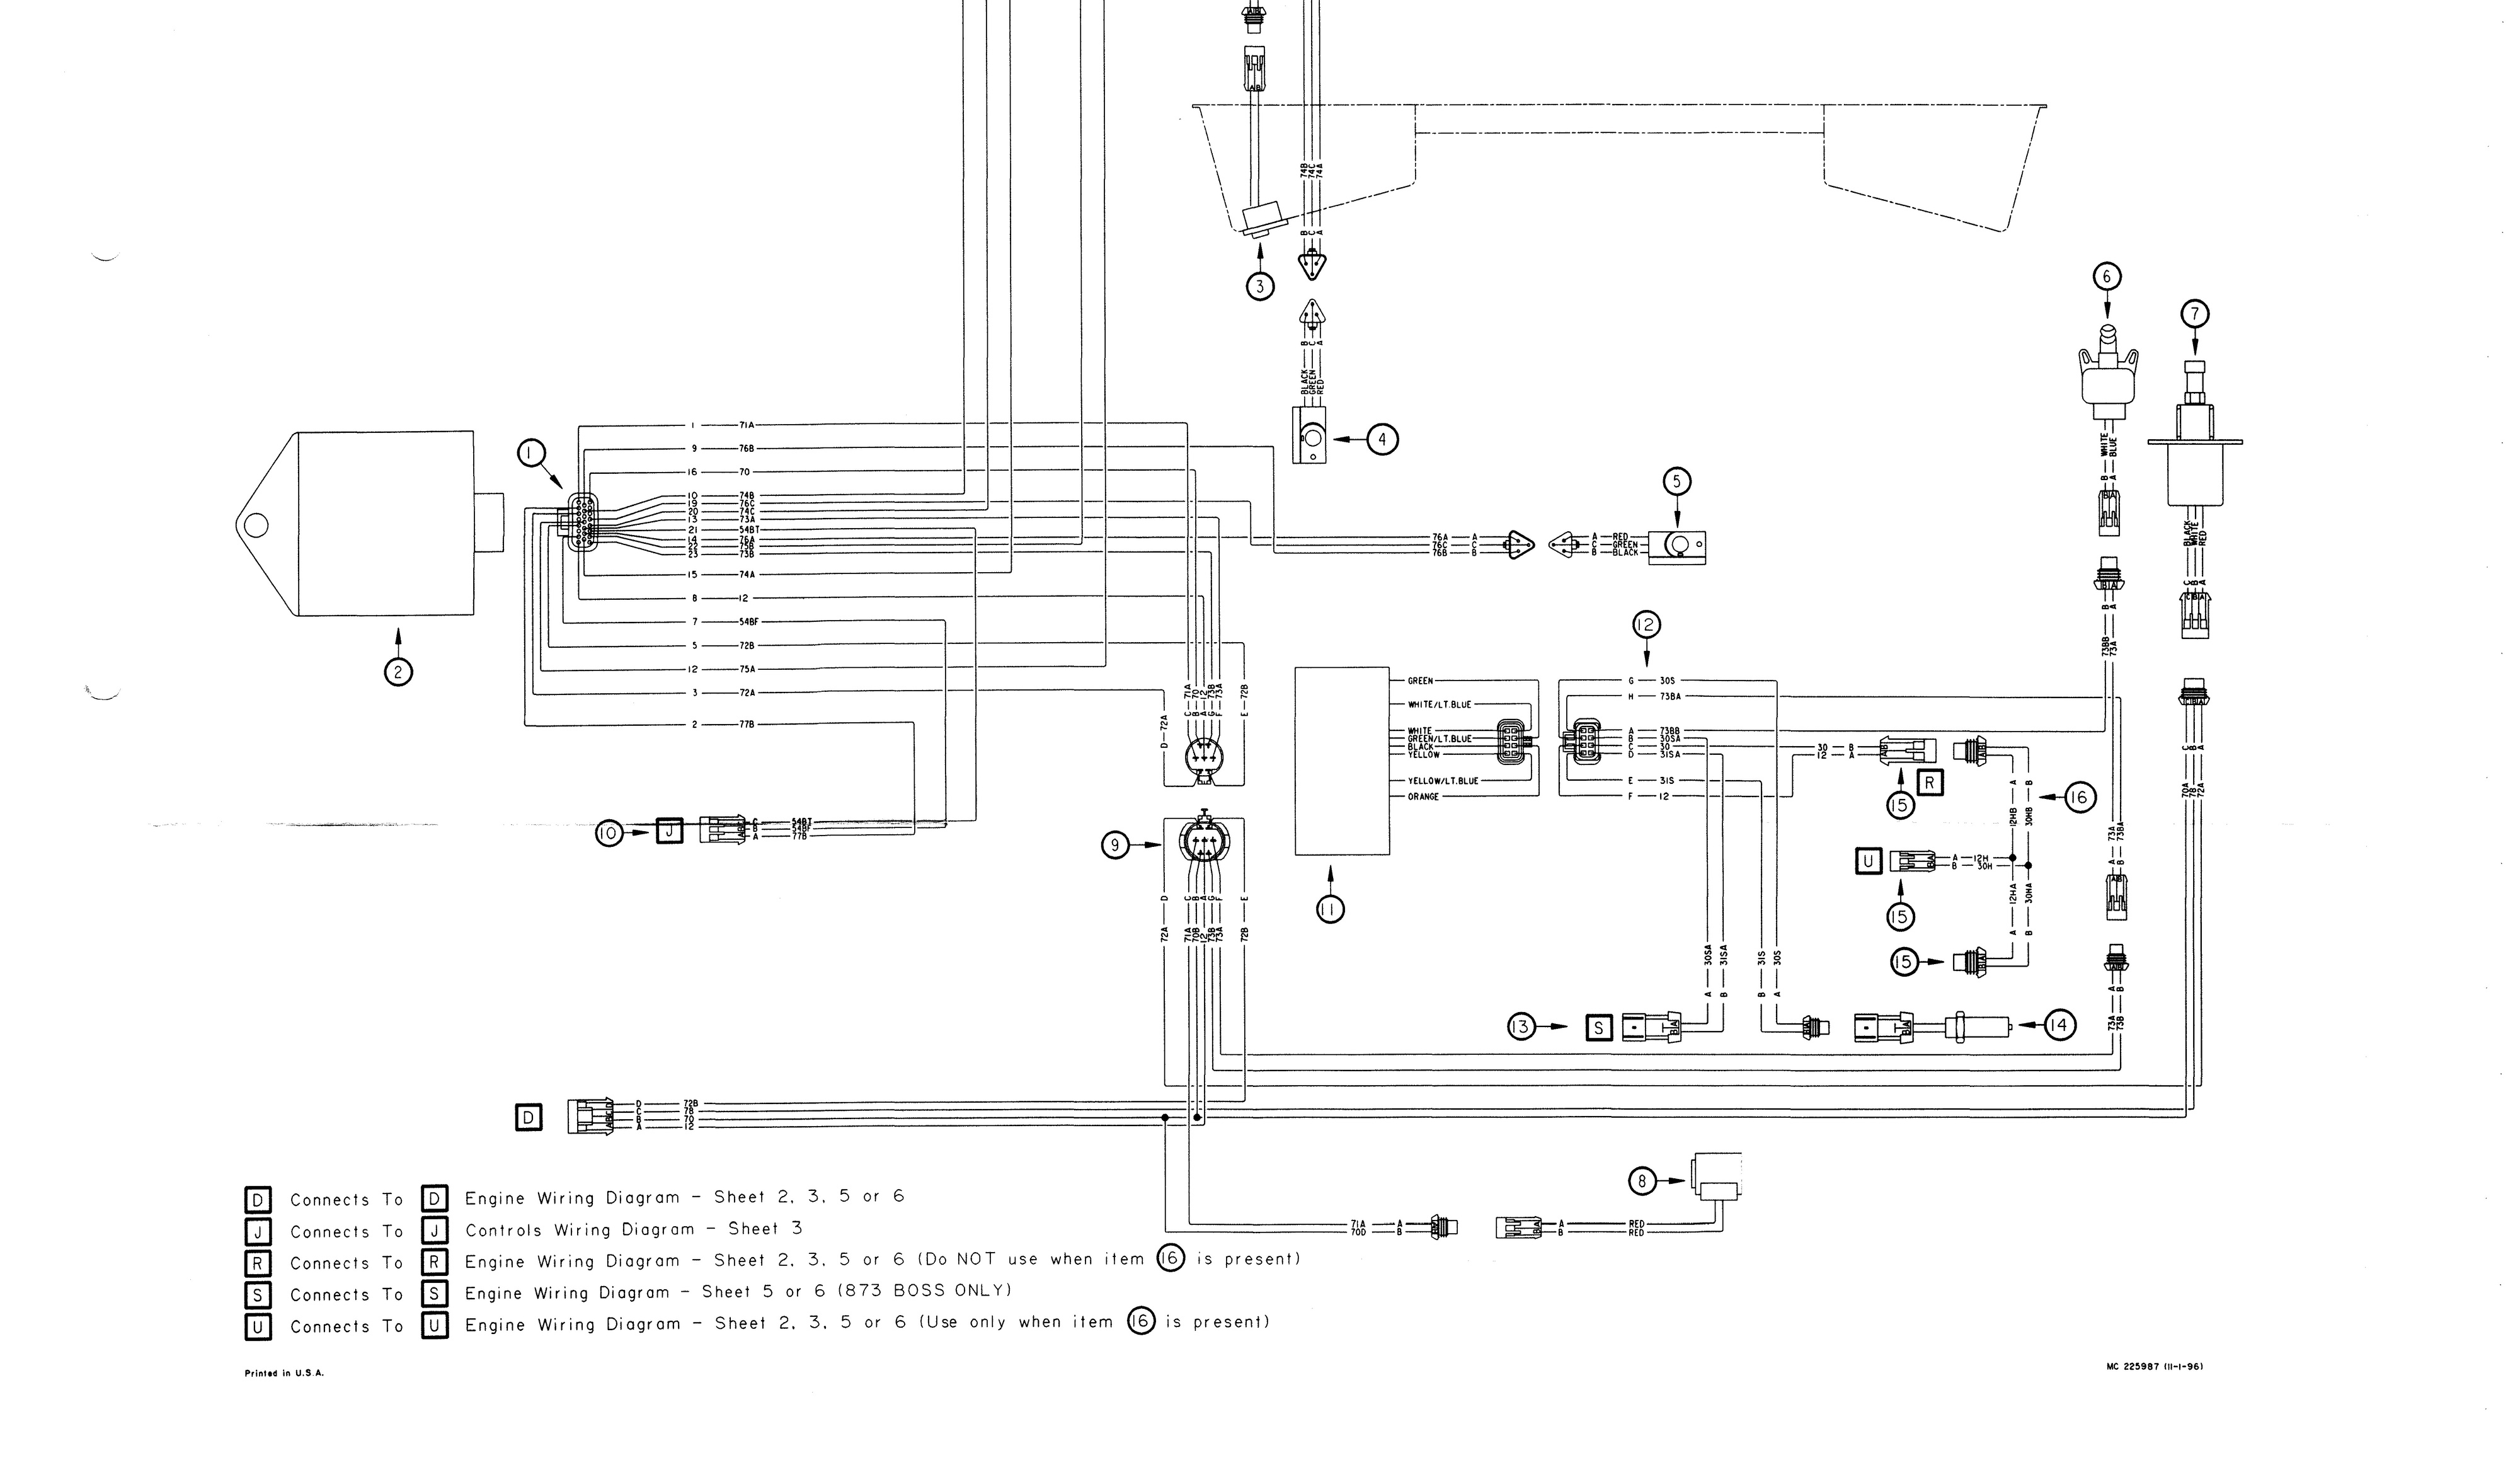 bobcat 873 skid steer loader factory service and repai series batteries diagram file format pdf language english printable yes